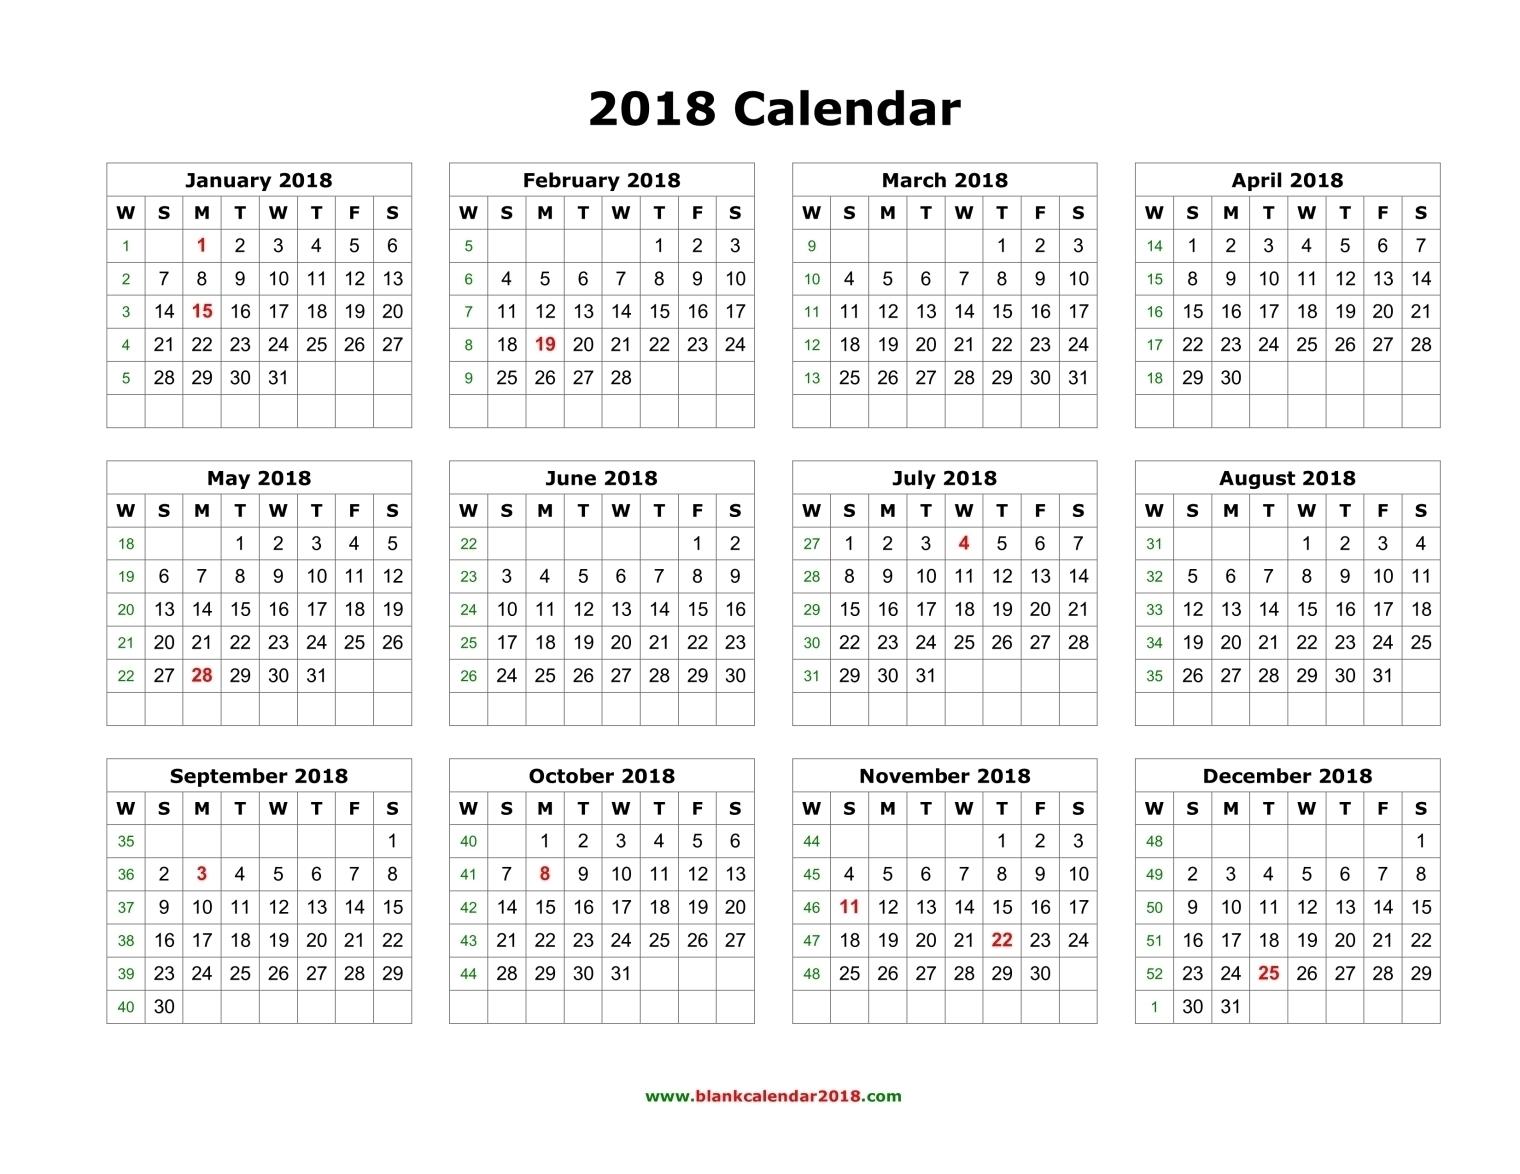 Blank Calendar 2018 pertaining to Print Blank Calendar Month By Month